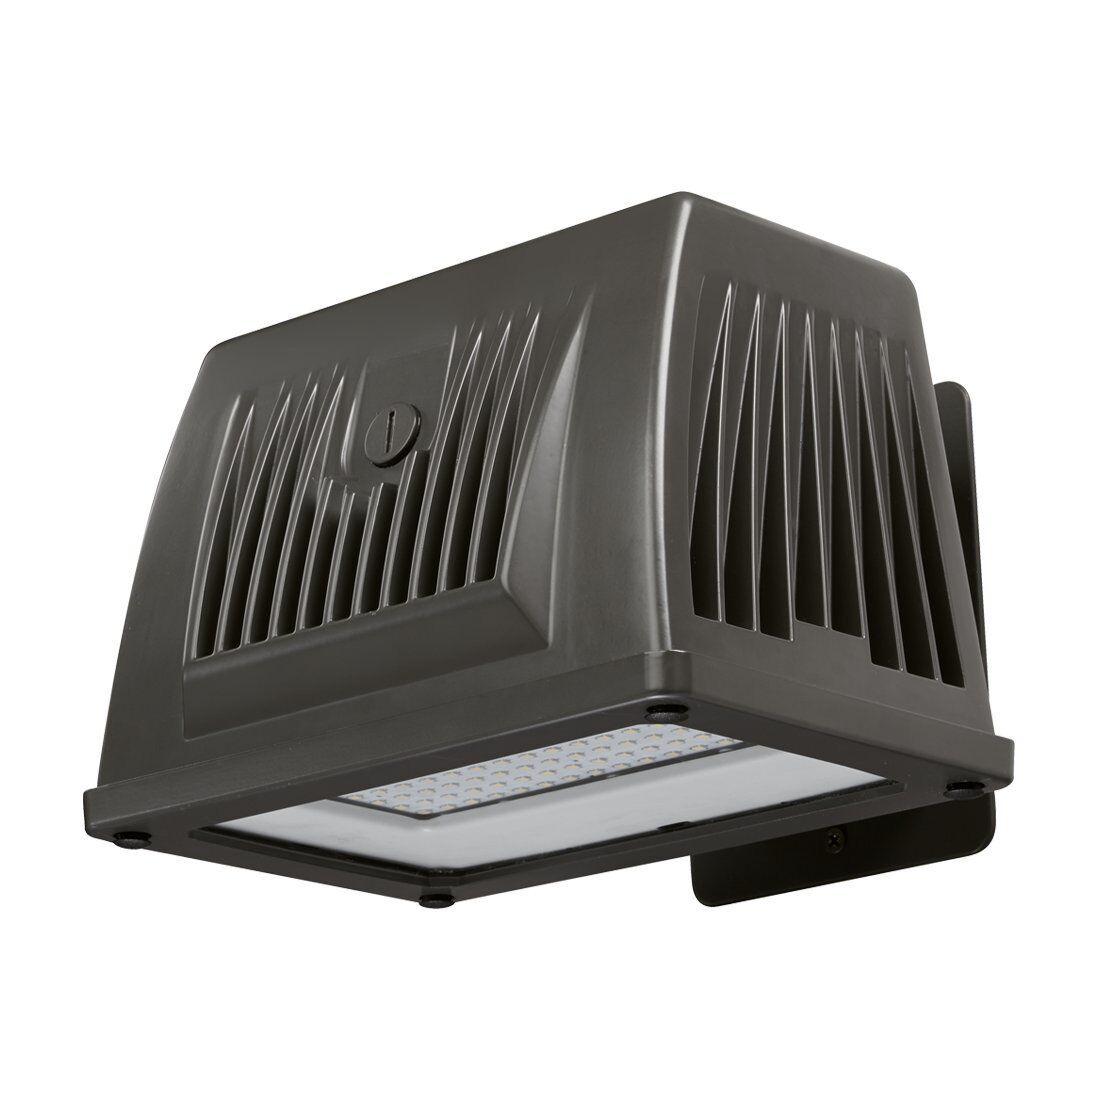 ATLAS LIGHTING - WPM43LED 43 Watt LED Alpha Wall Pack Pro 4500K Pure Weiß